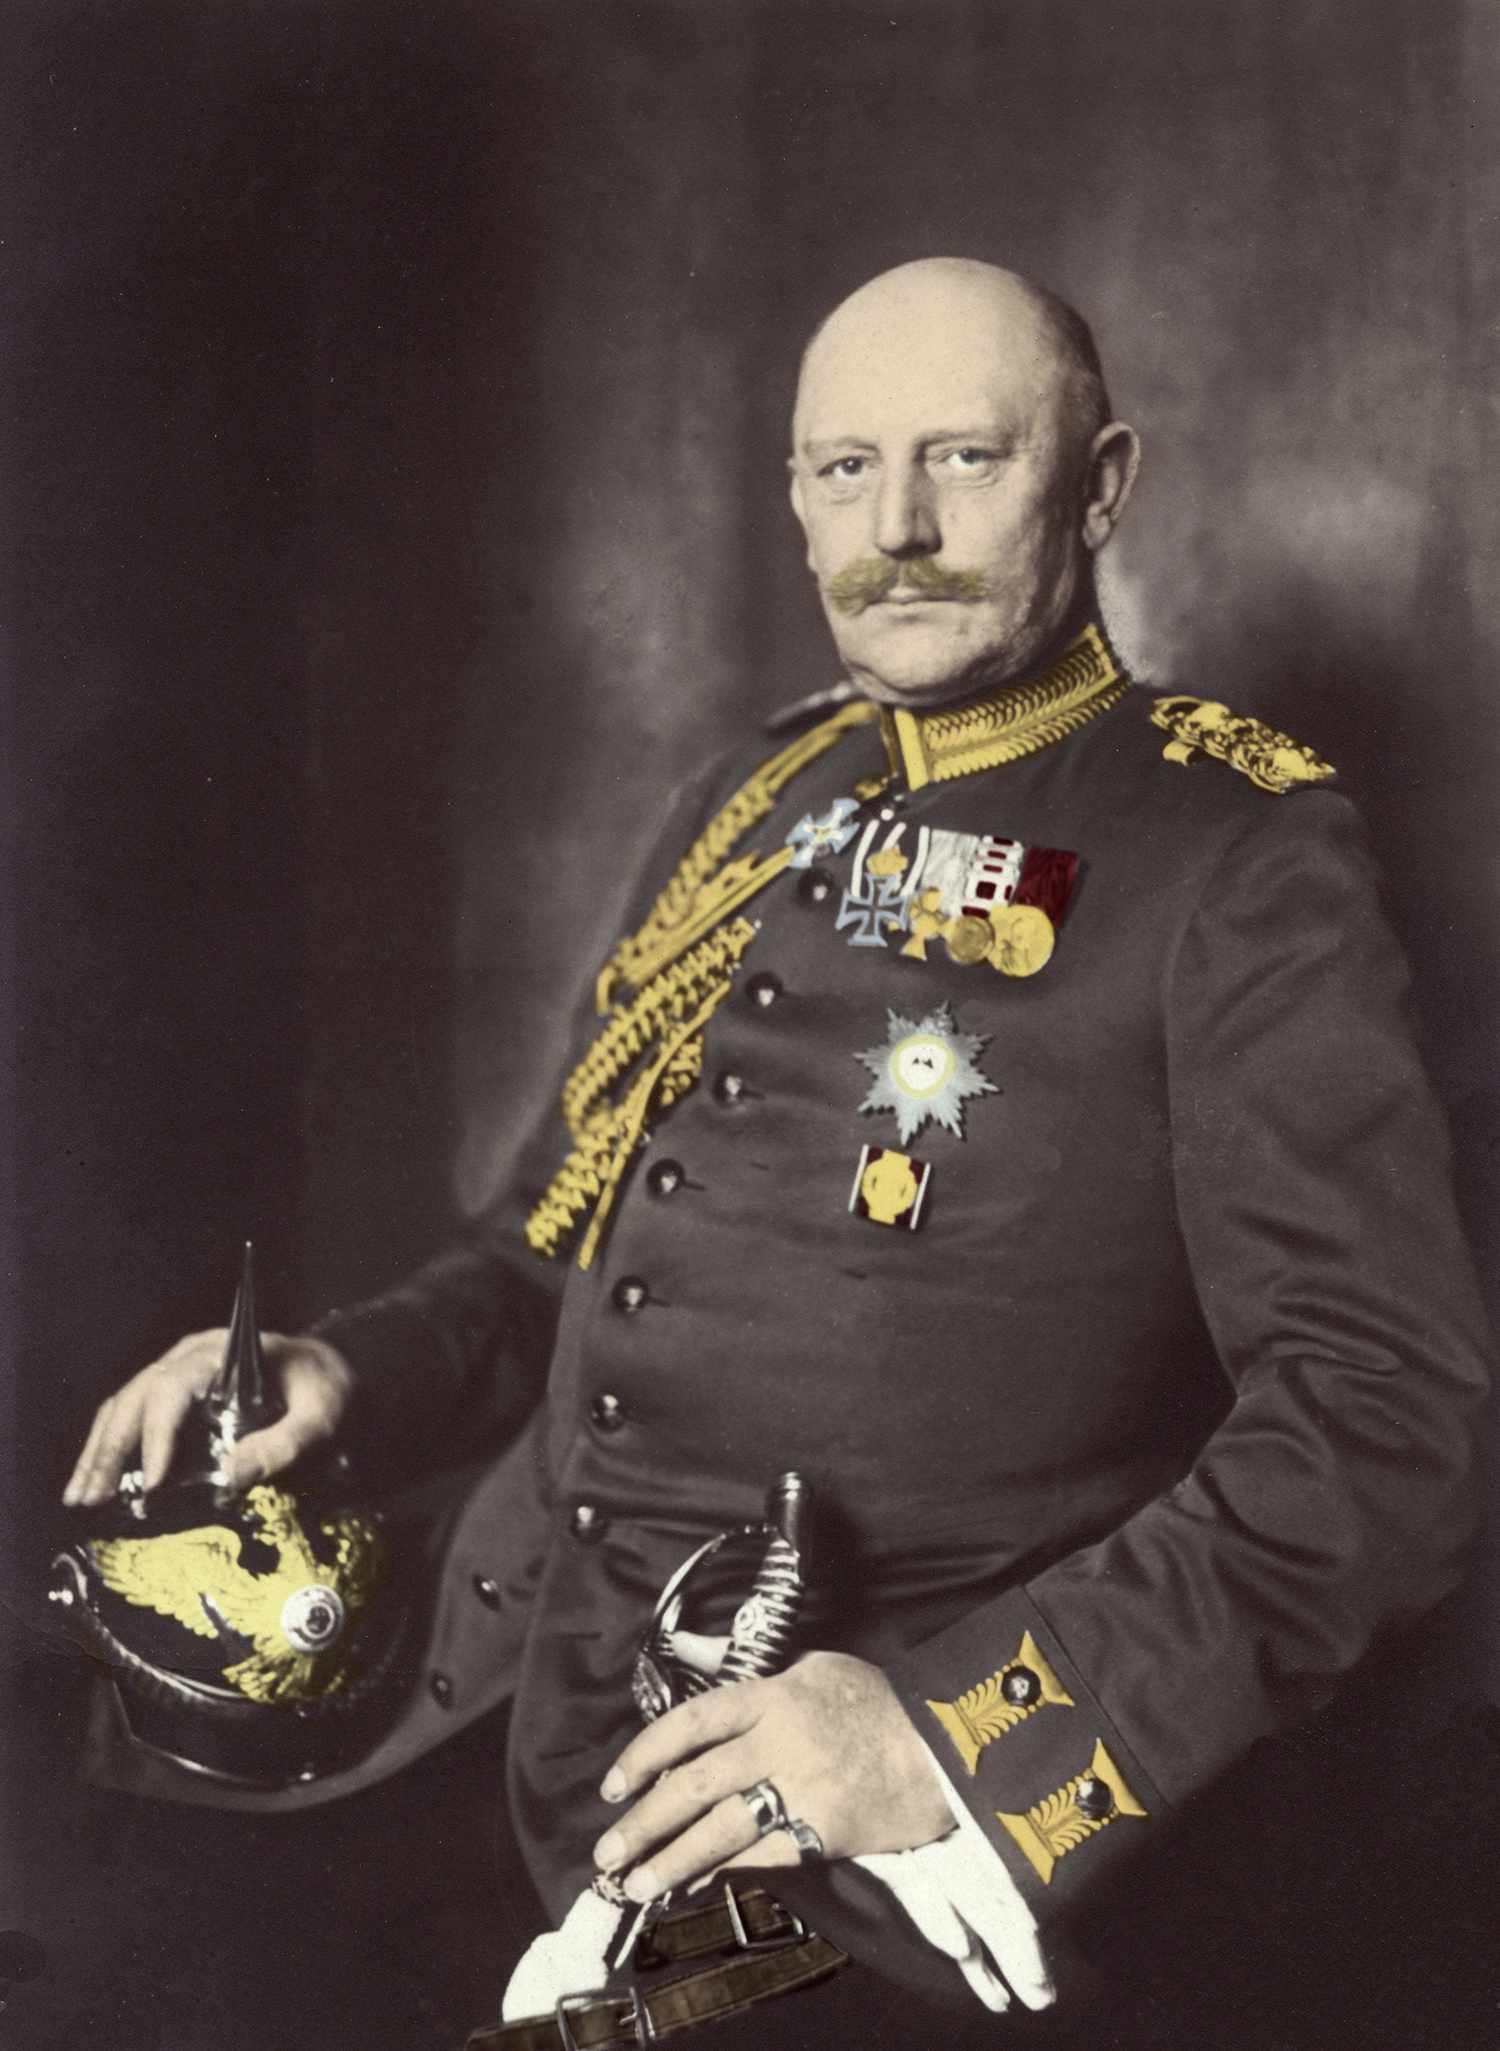 Helmuth Johann Ludwig, count von Moltke